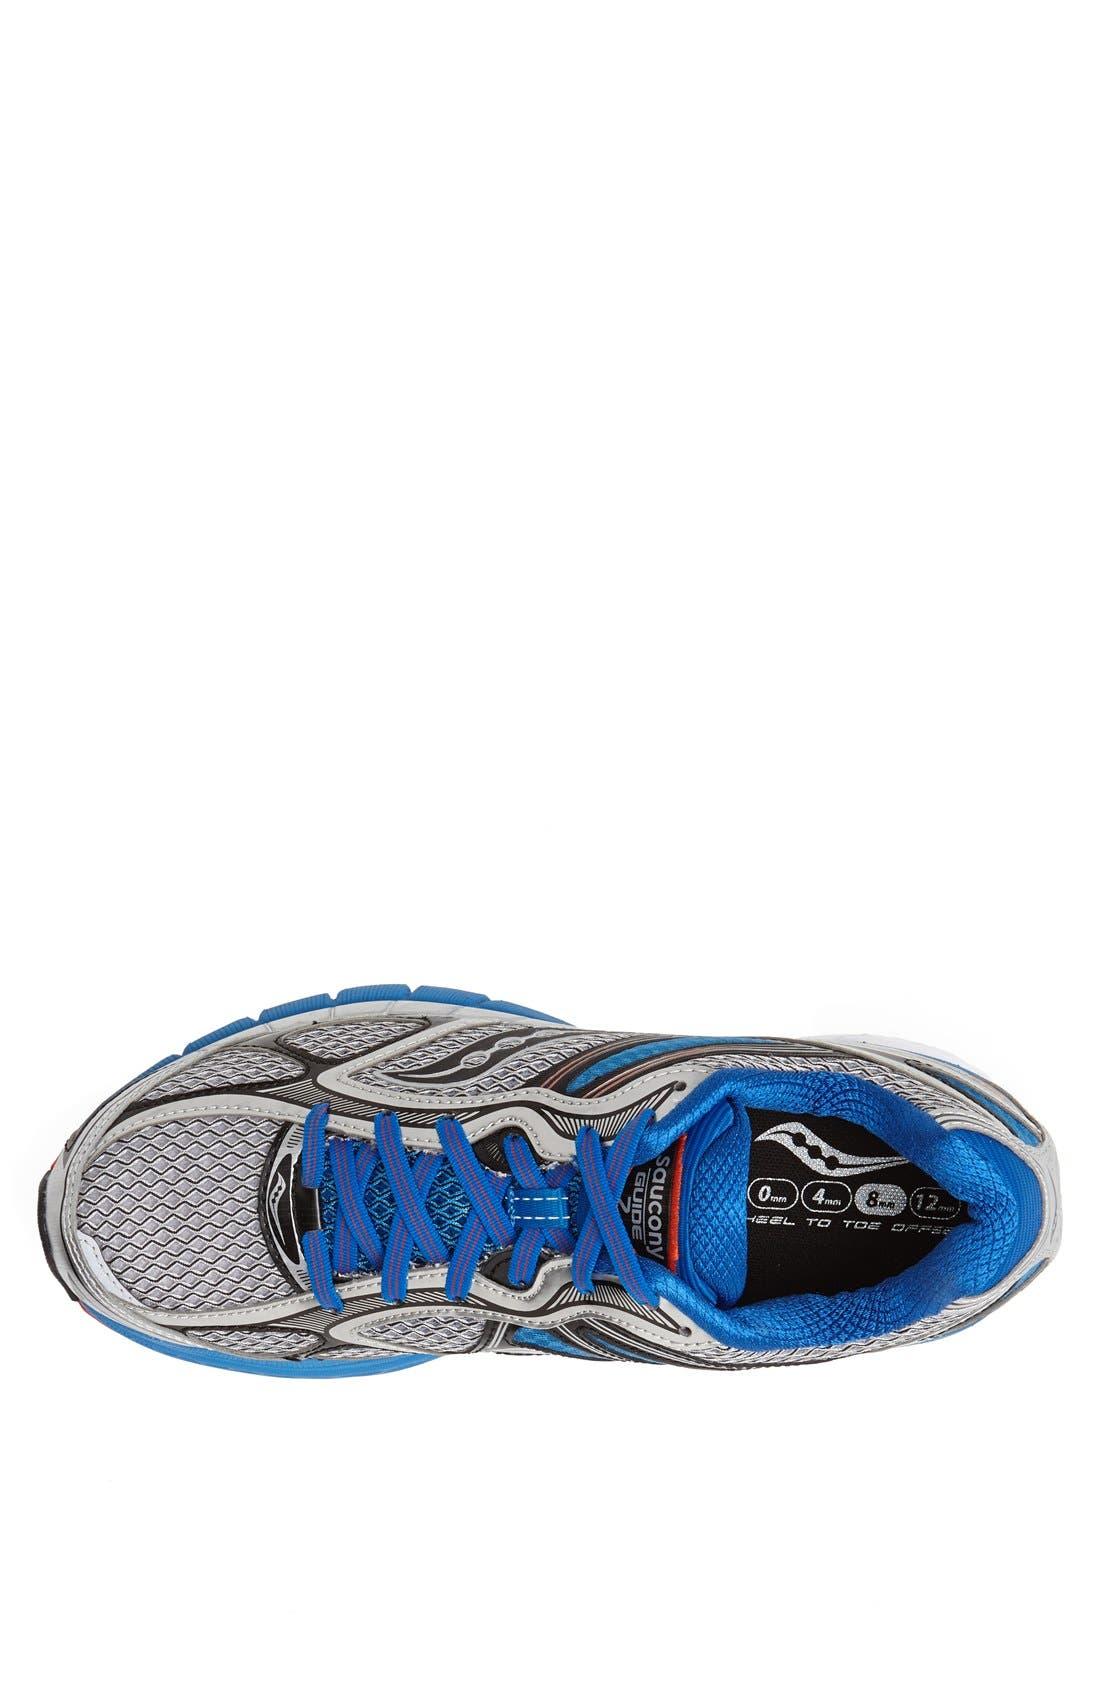 Alternate Image 3  - Saucony 'Guide 7' Running Shoe (Men)